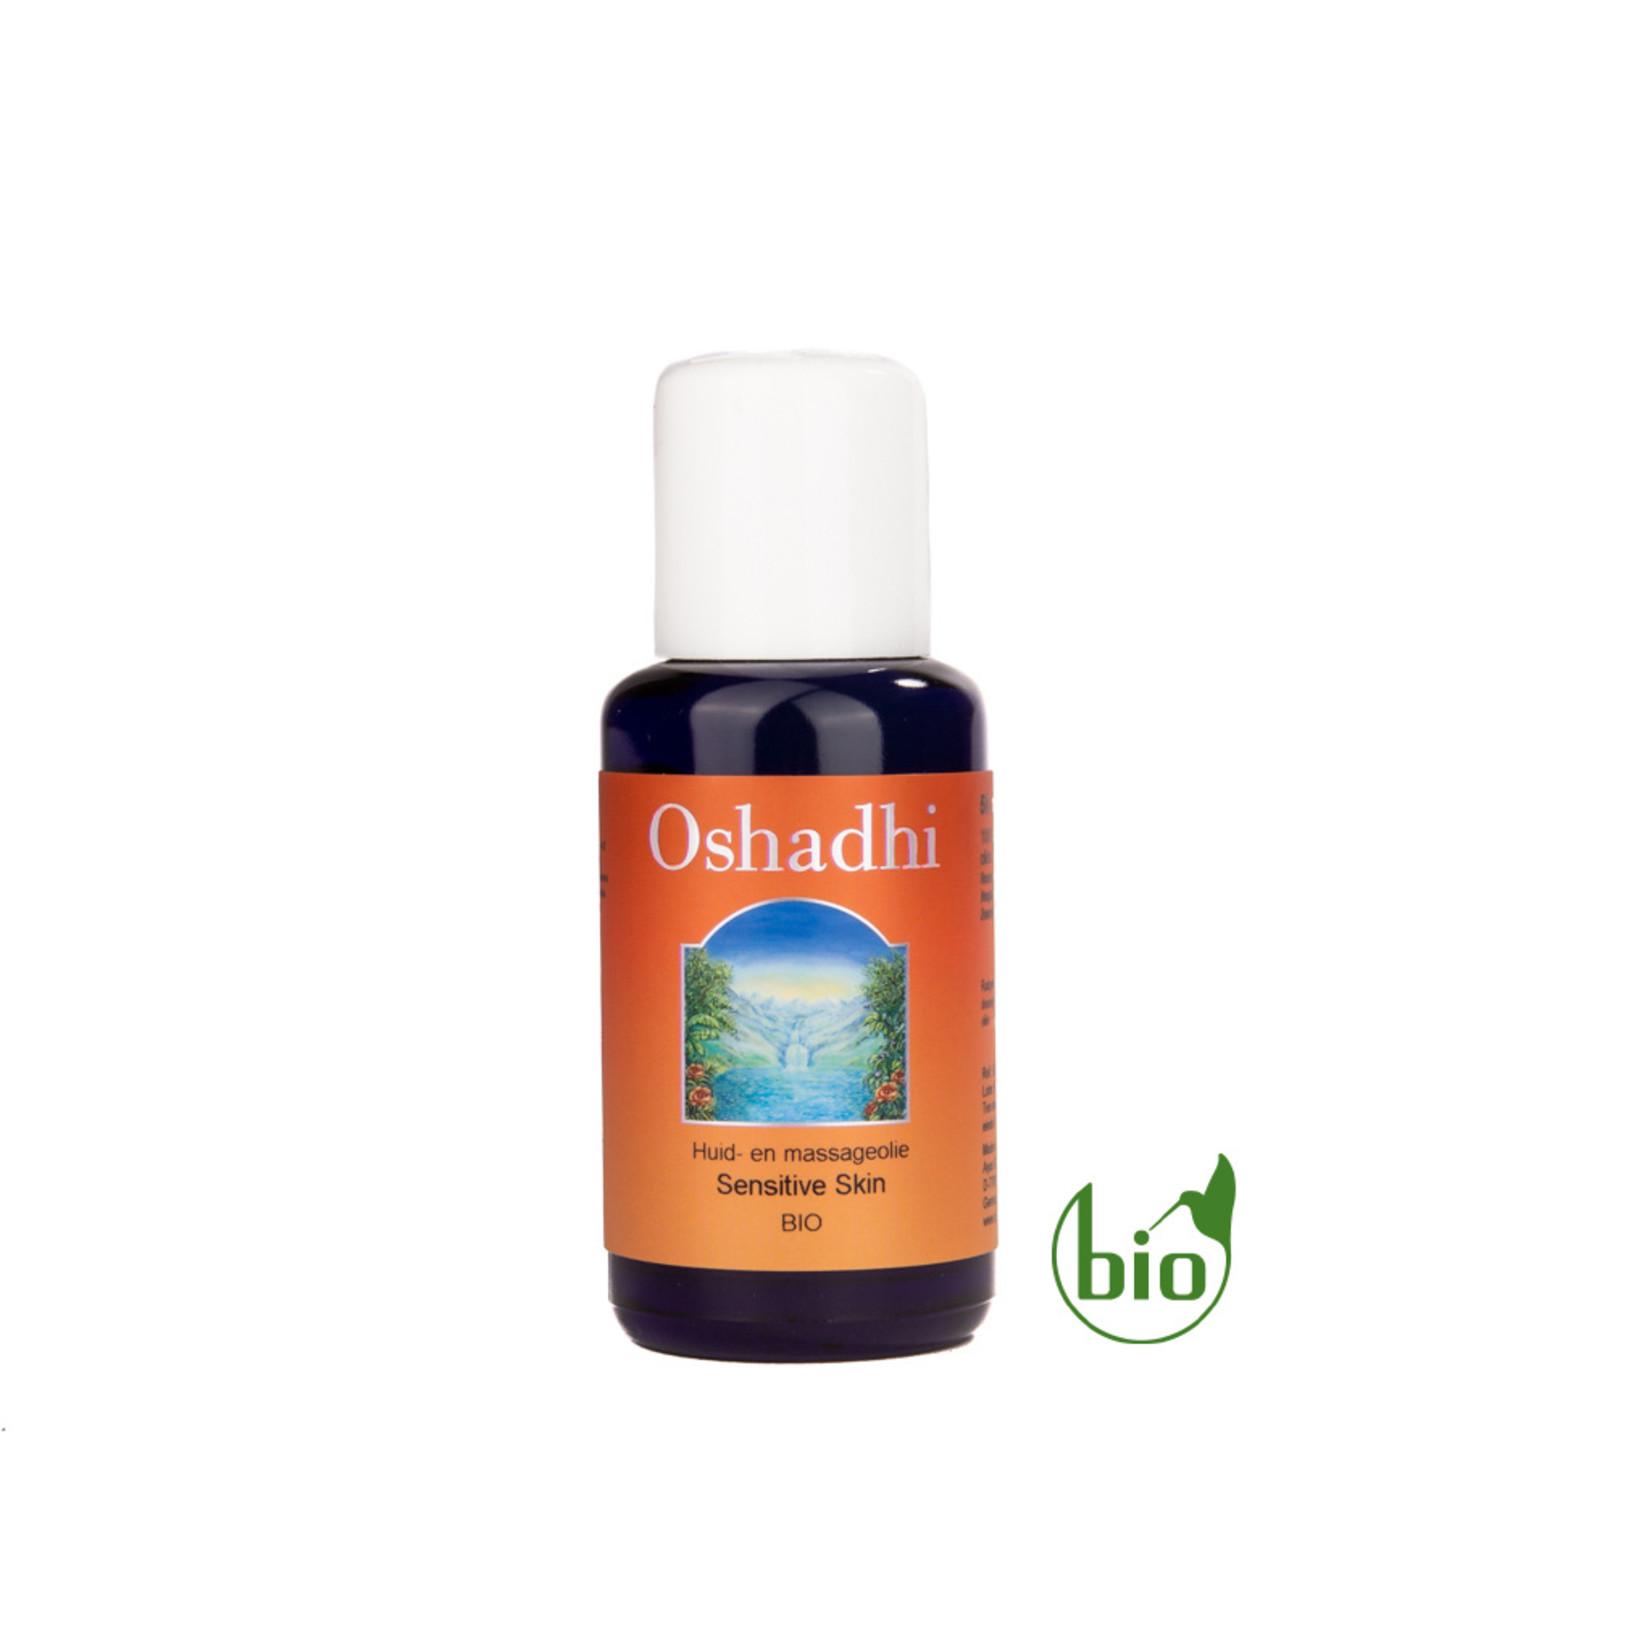 Oshadhi Sensitive Skin lichaam en massageolie Oshadhi - koestering - 50ml